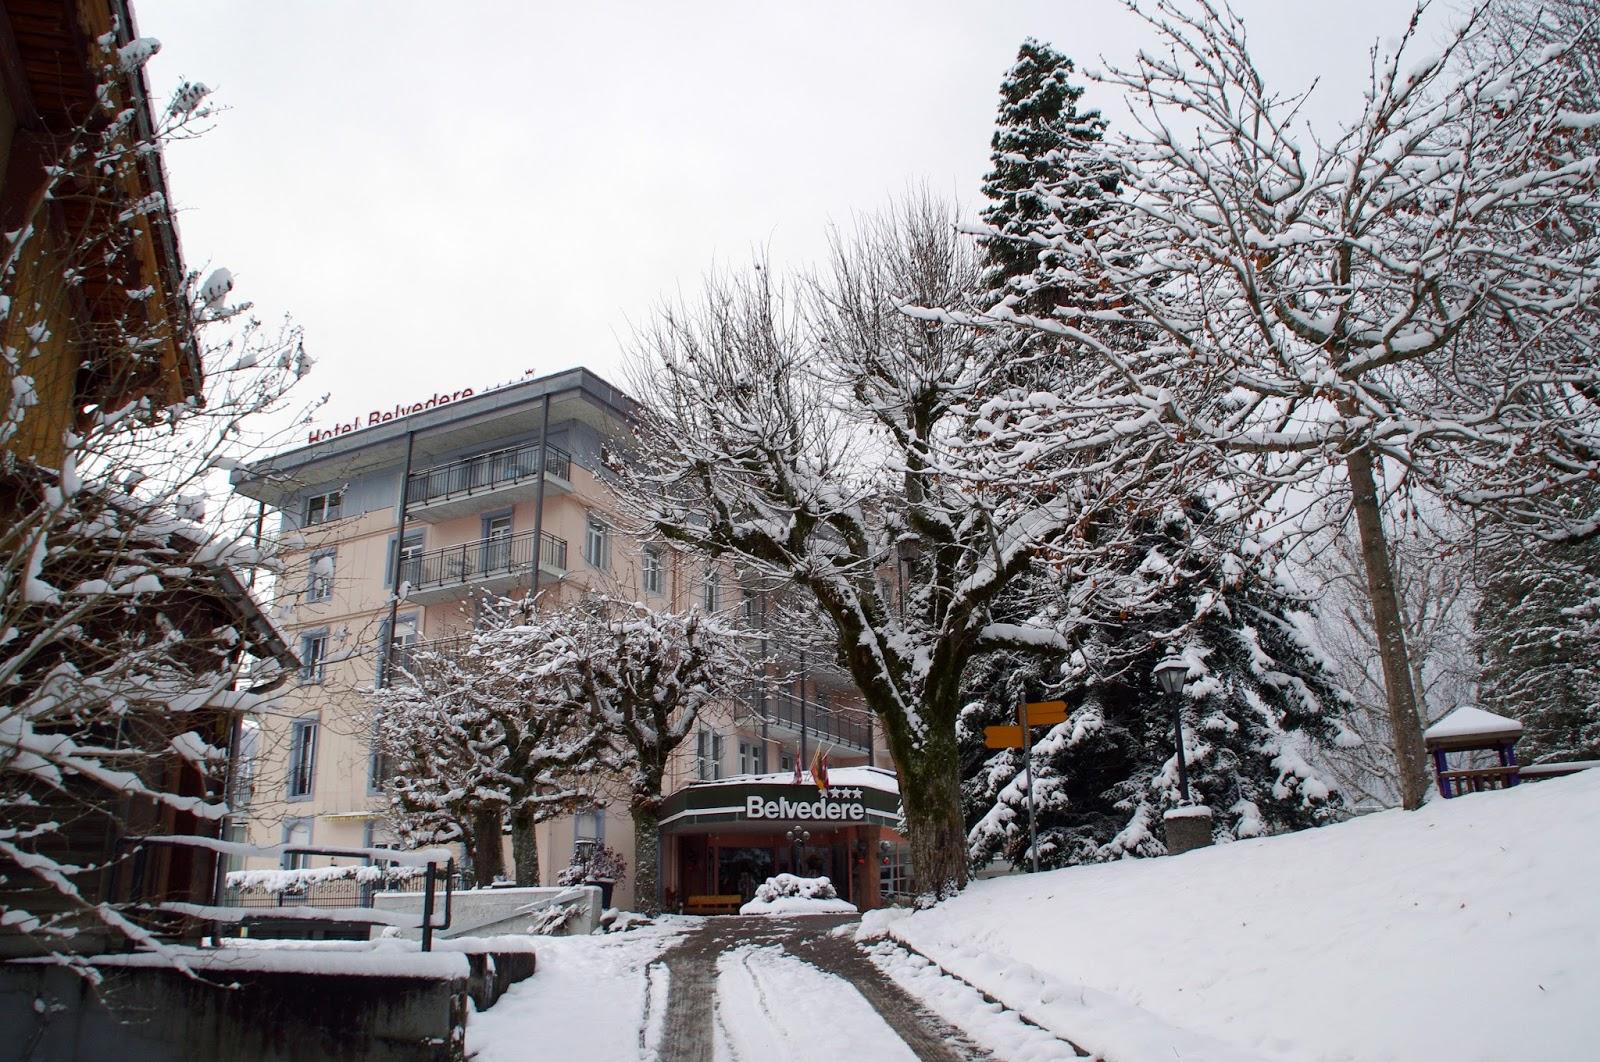 Hotel Belvedere Grindelwald  Exterior Winter